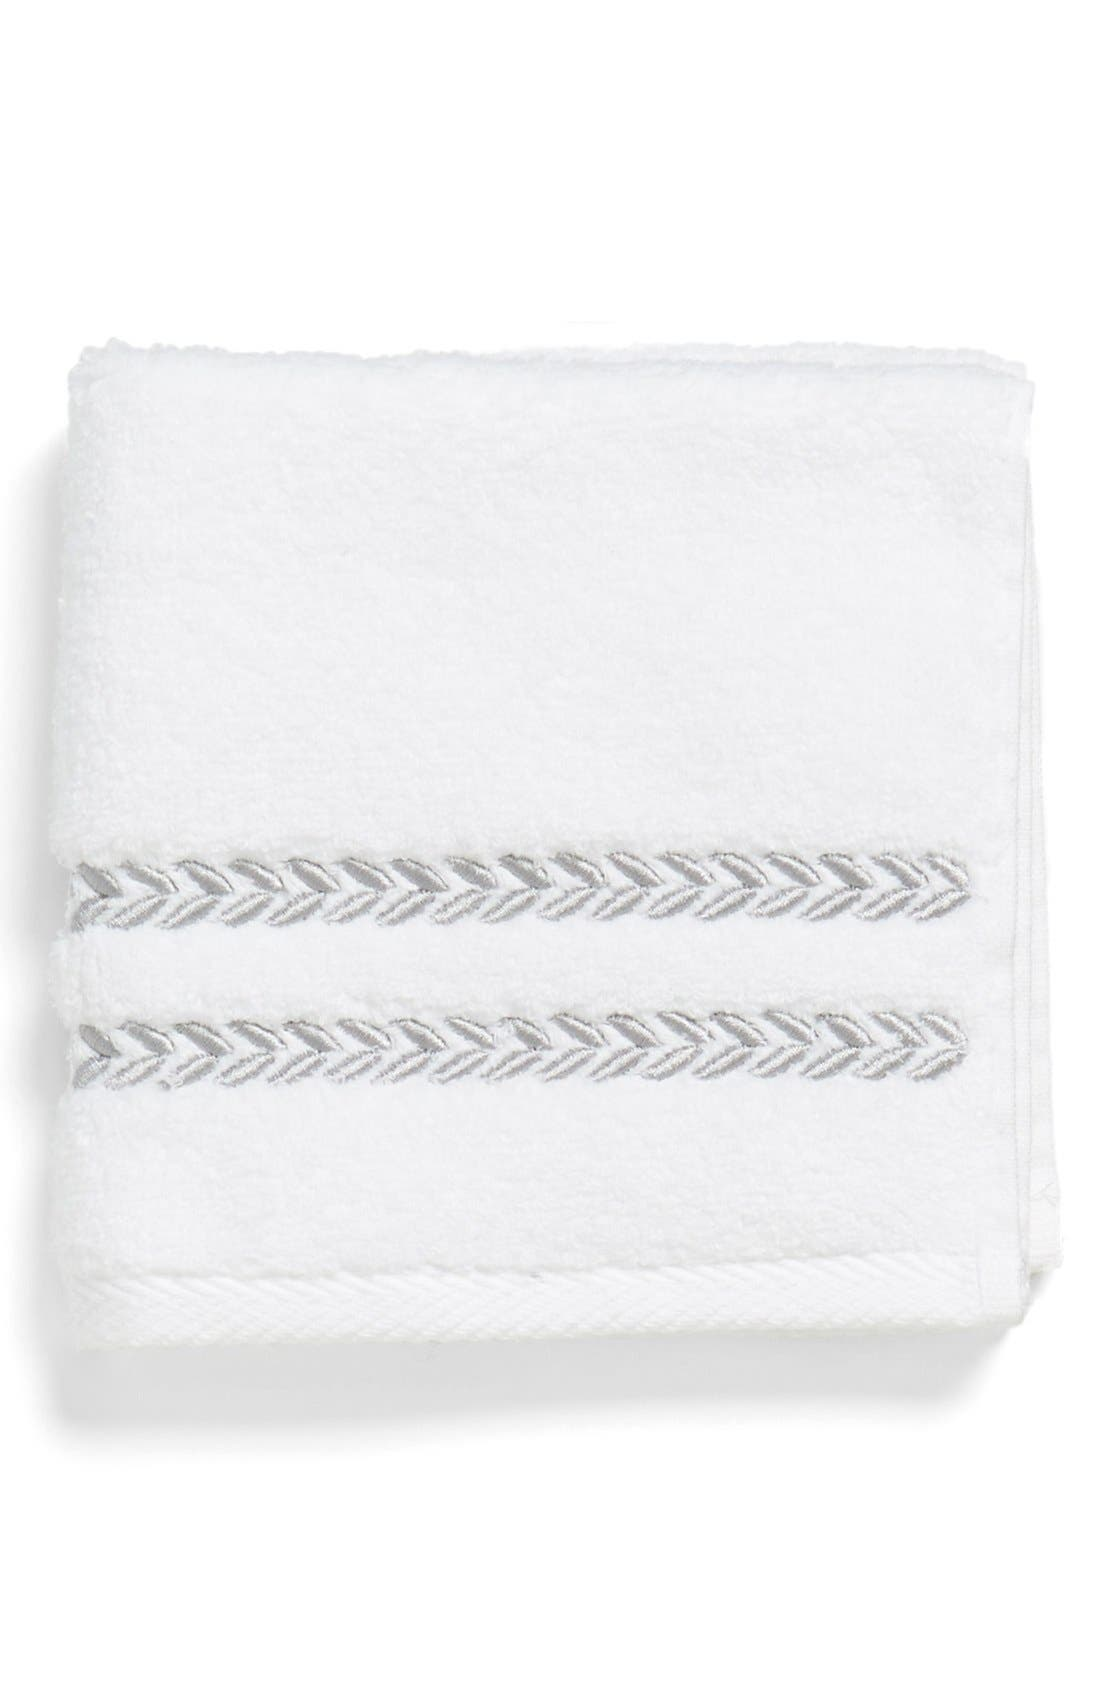 'Pearl Essence' Wash Towel,                             Main thumbnail 5, color,